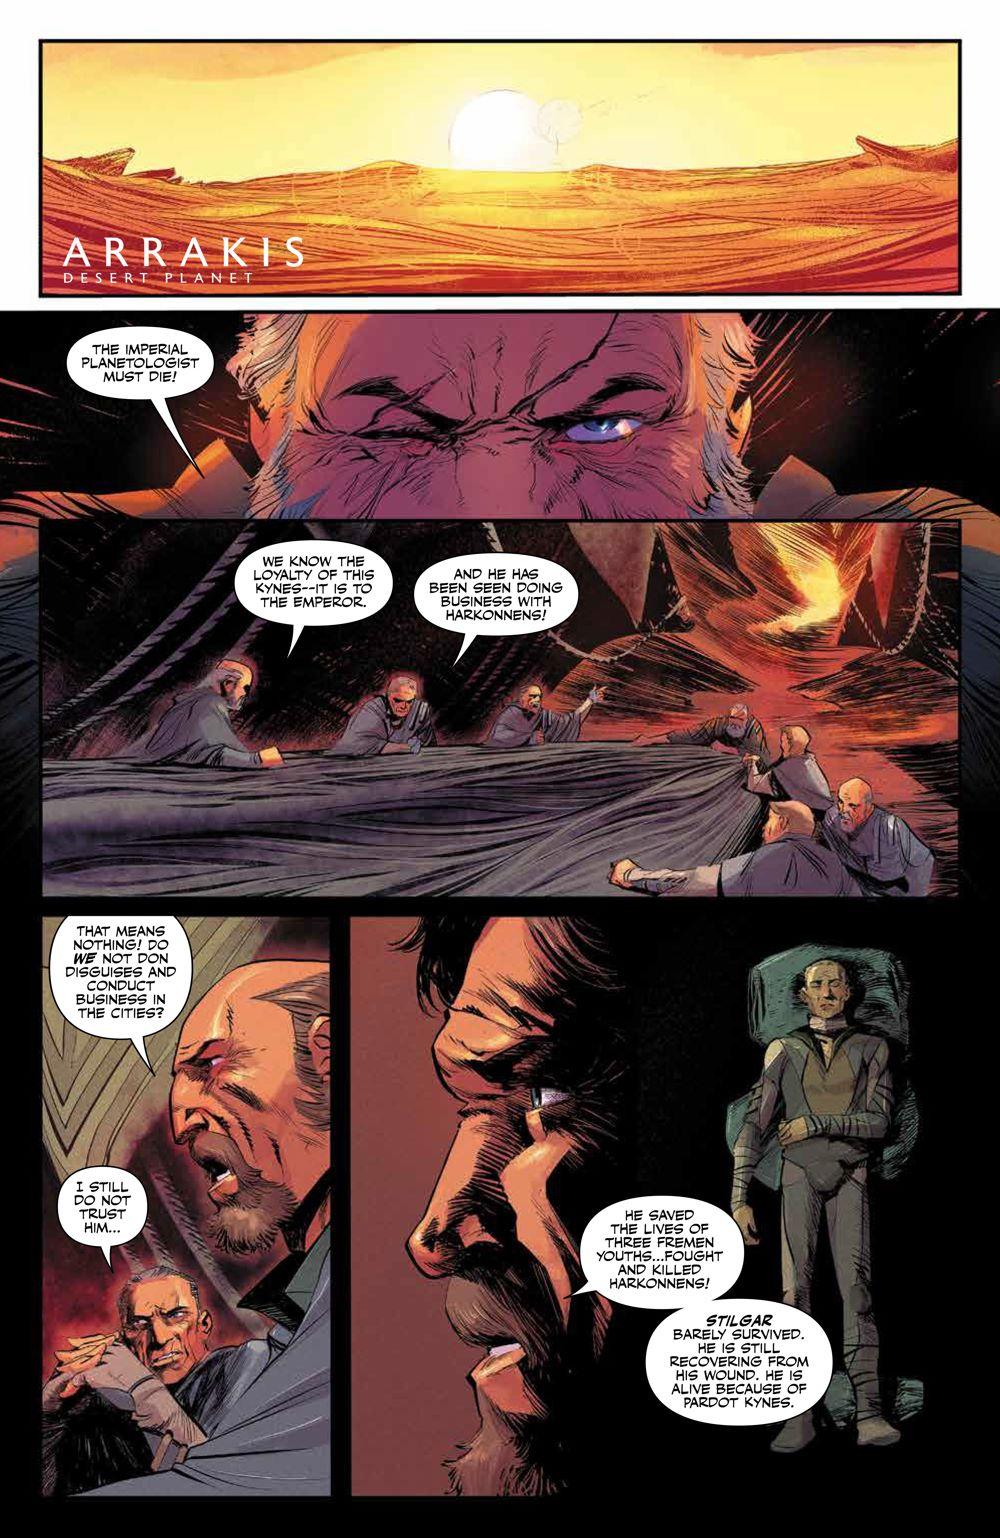 Dune_HouseAtreides_005_PRESS_3 ComicList Previews: DUNE HOUSE ATREIDES #5 (OF 12)